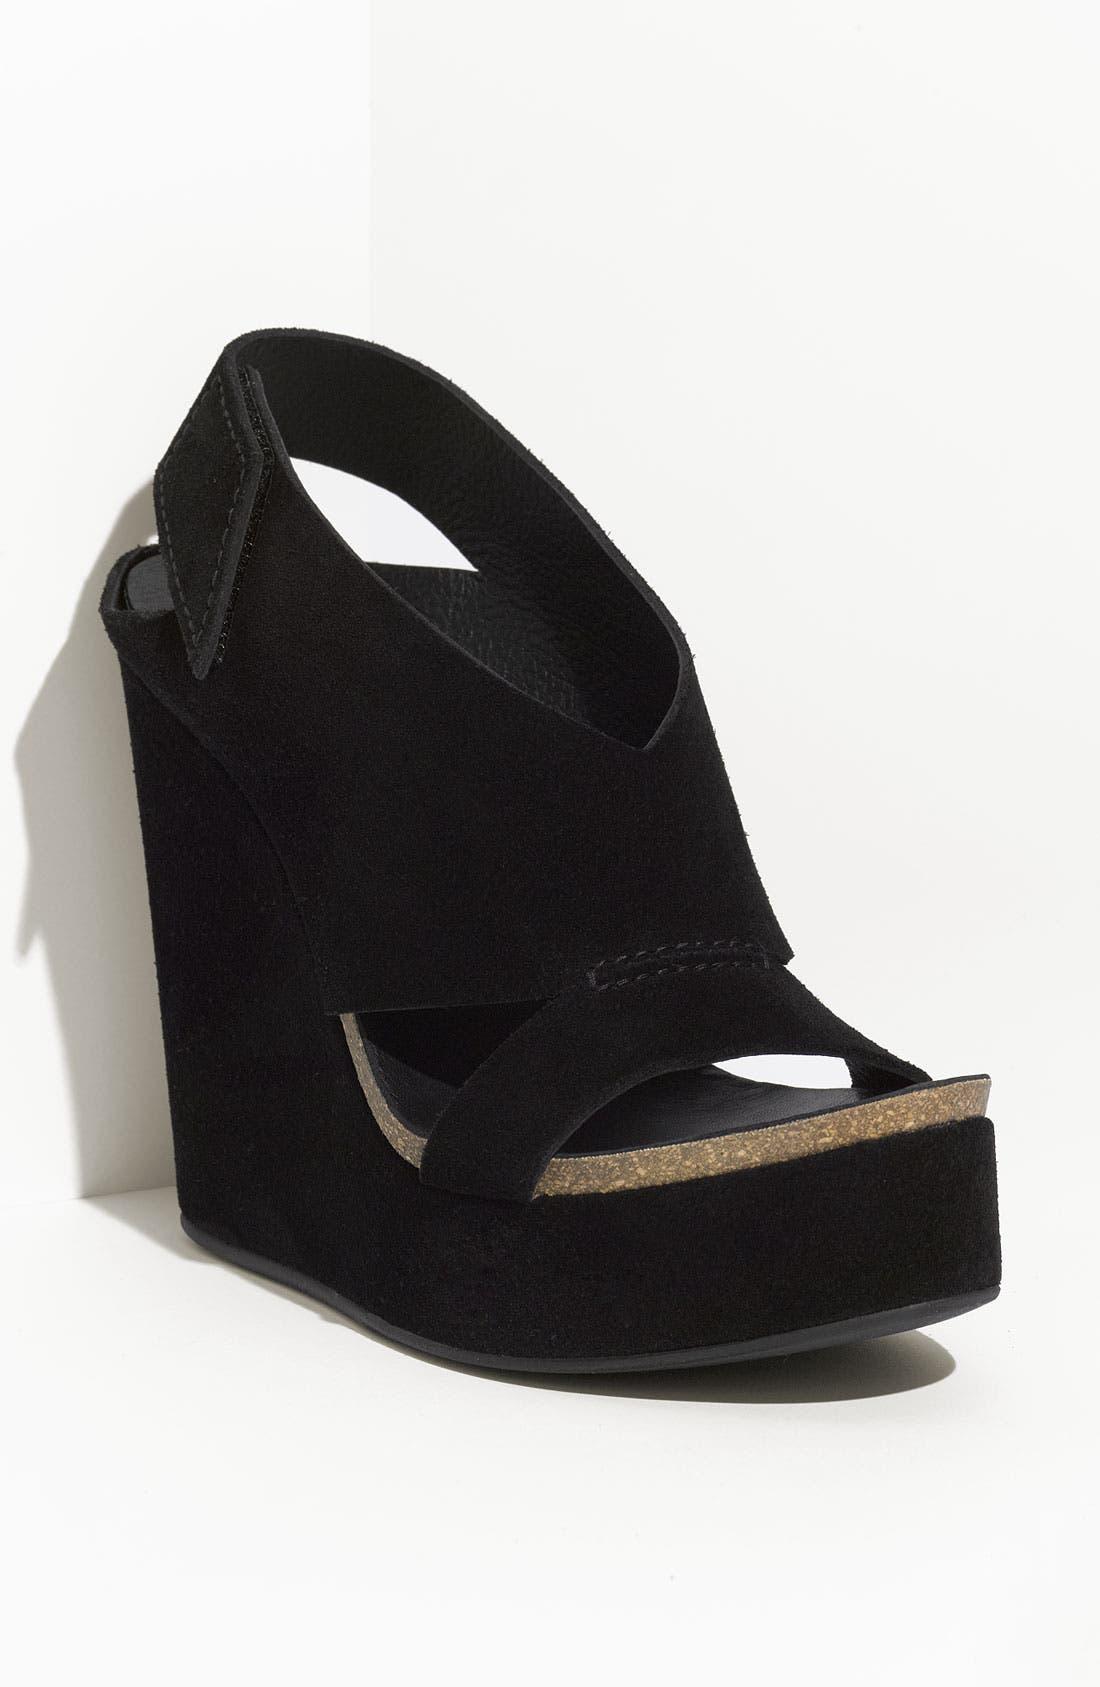 Main Image - Pedro Garcia 'Tamesis' Velour Sandal